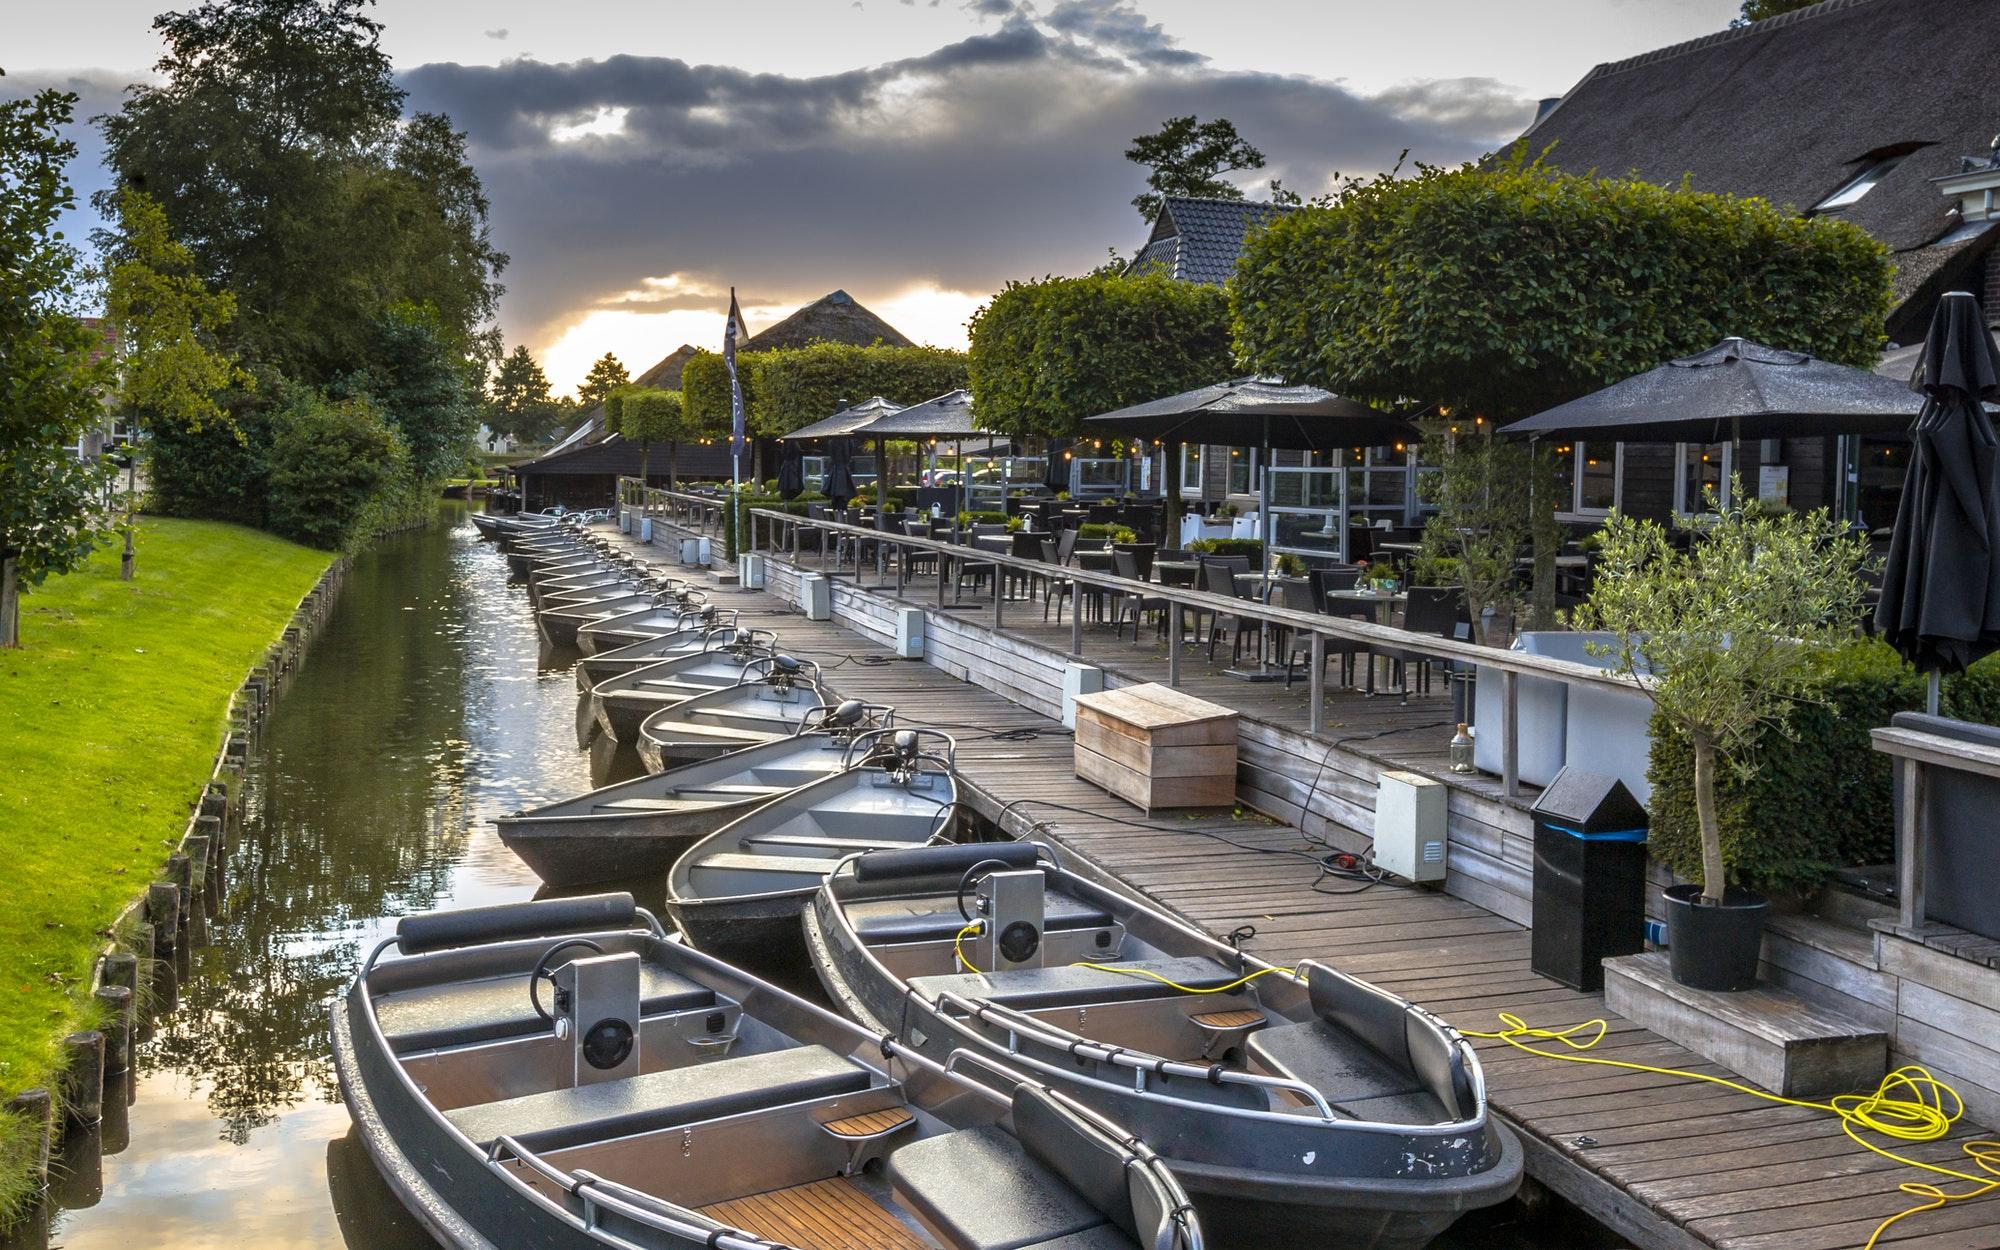 Rental boats Giethoorn